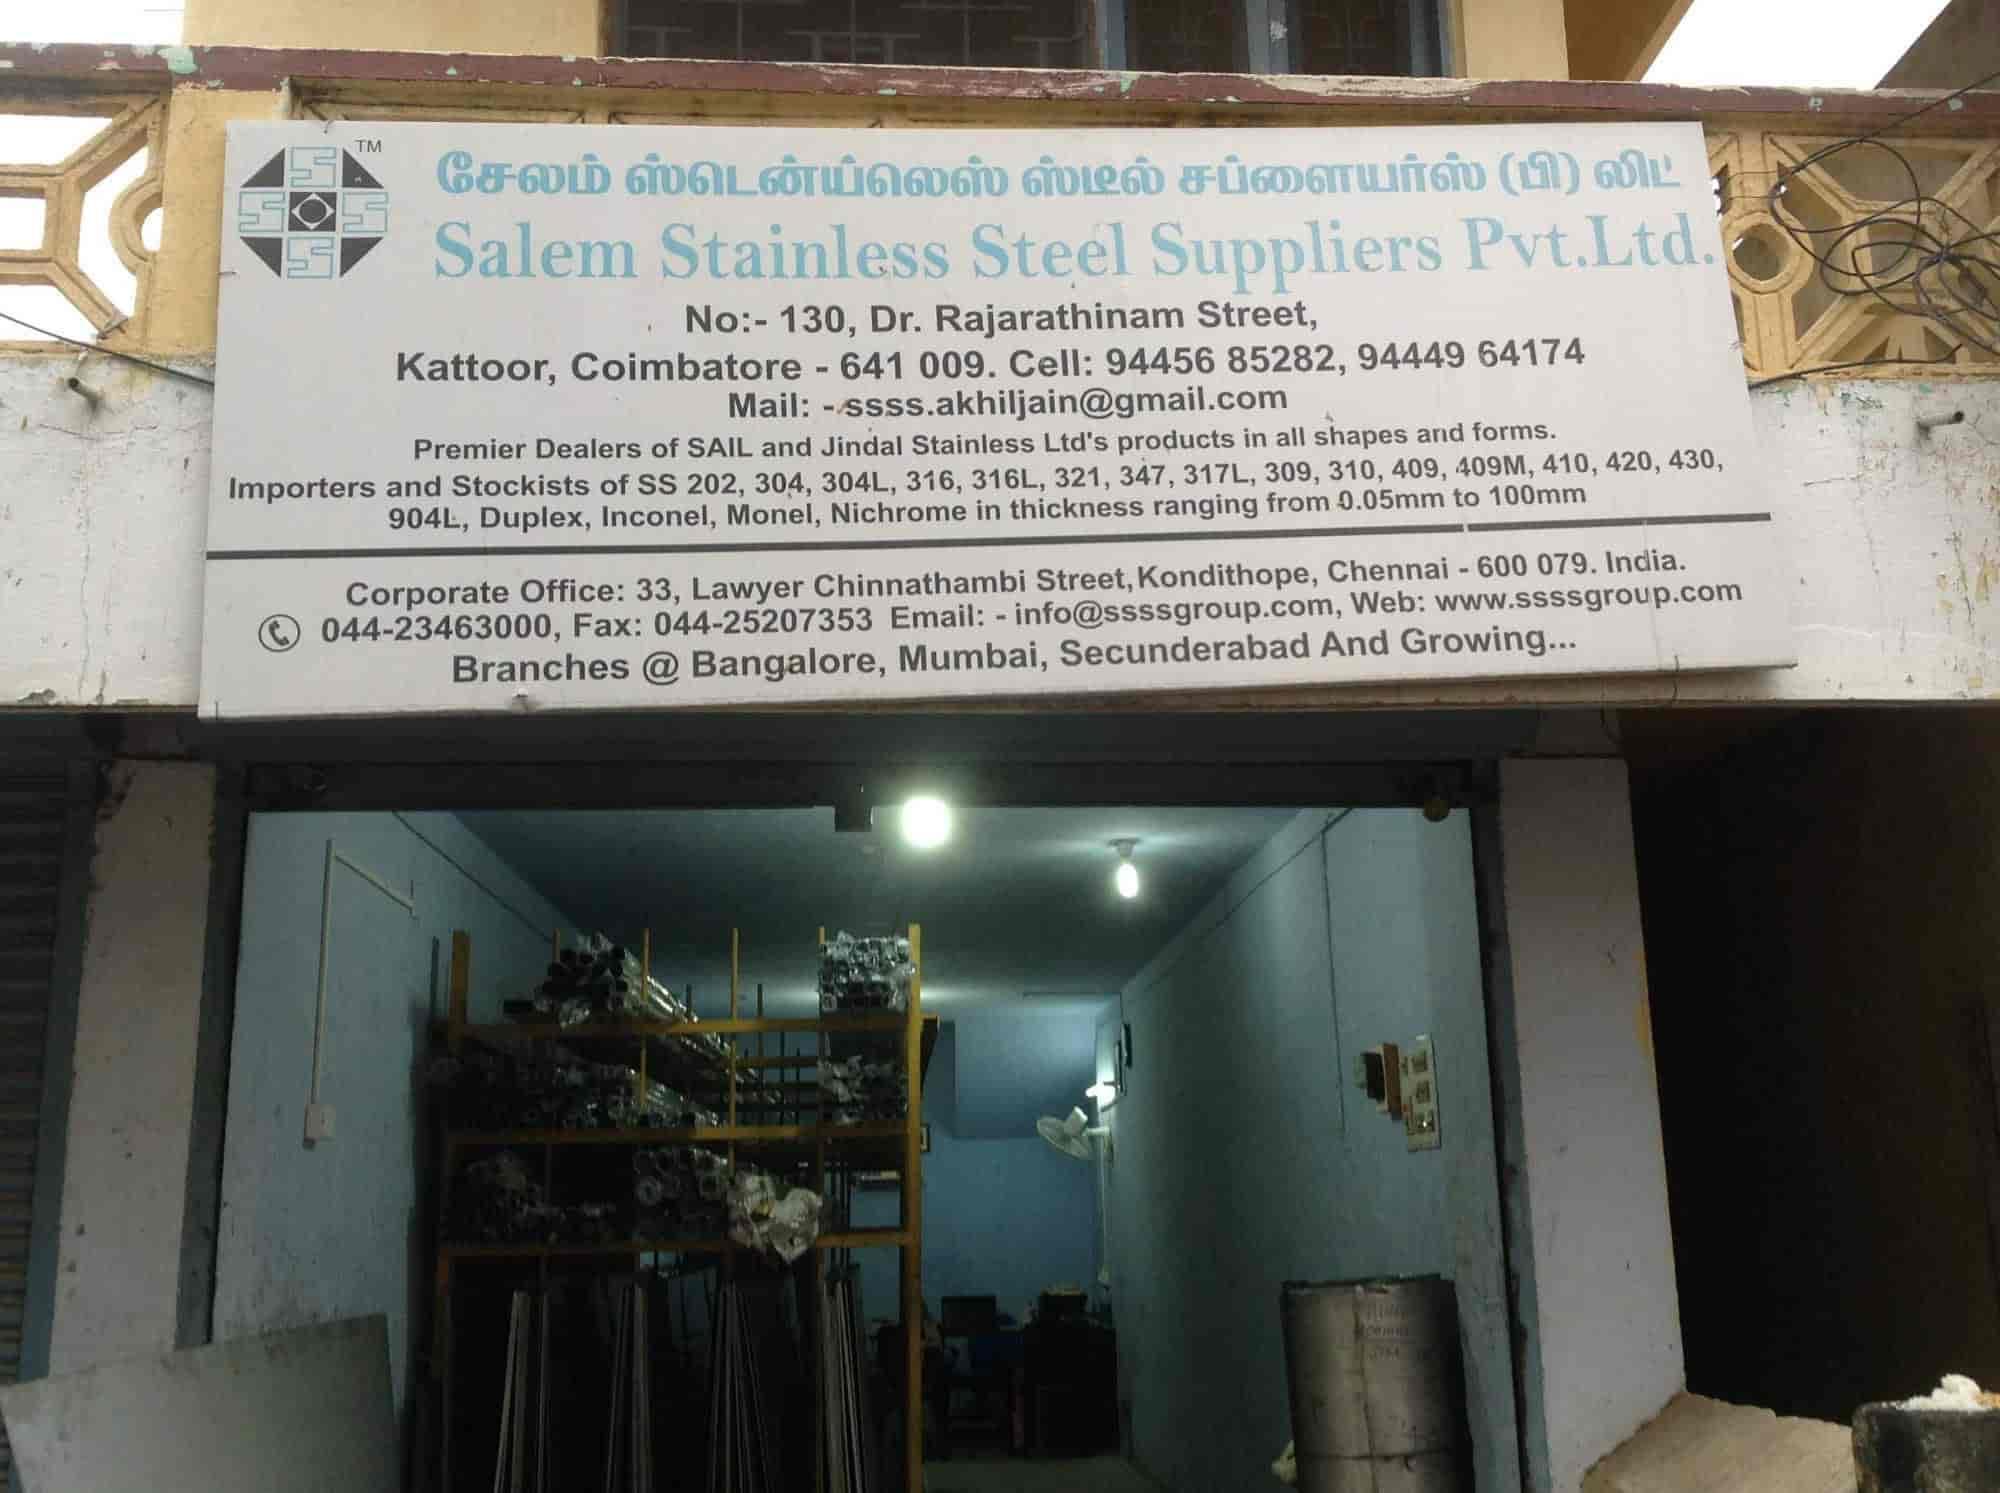 Salem Stainless Steel Suppliers Pvt Ltd, Chinnavedampatti - Salem